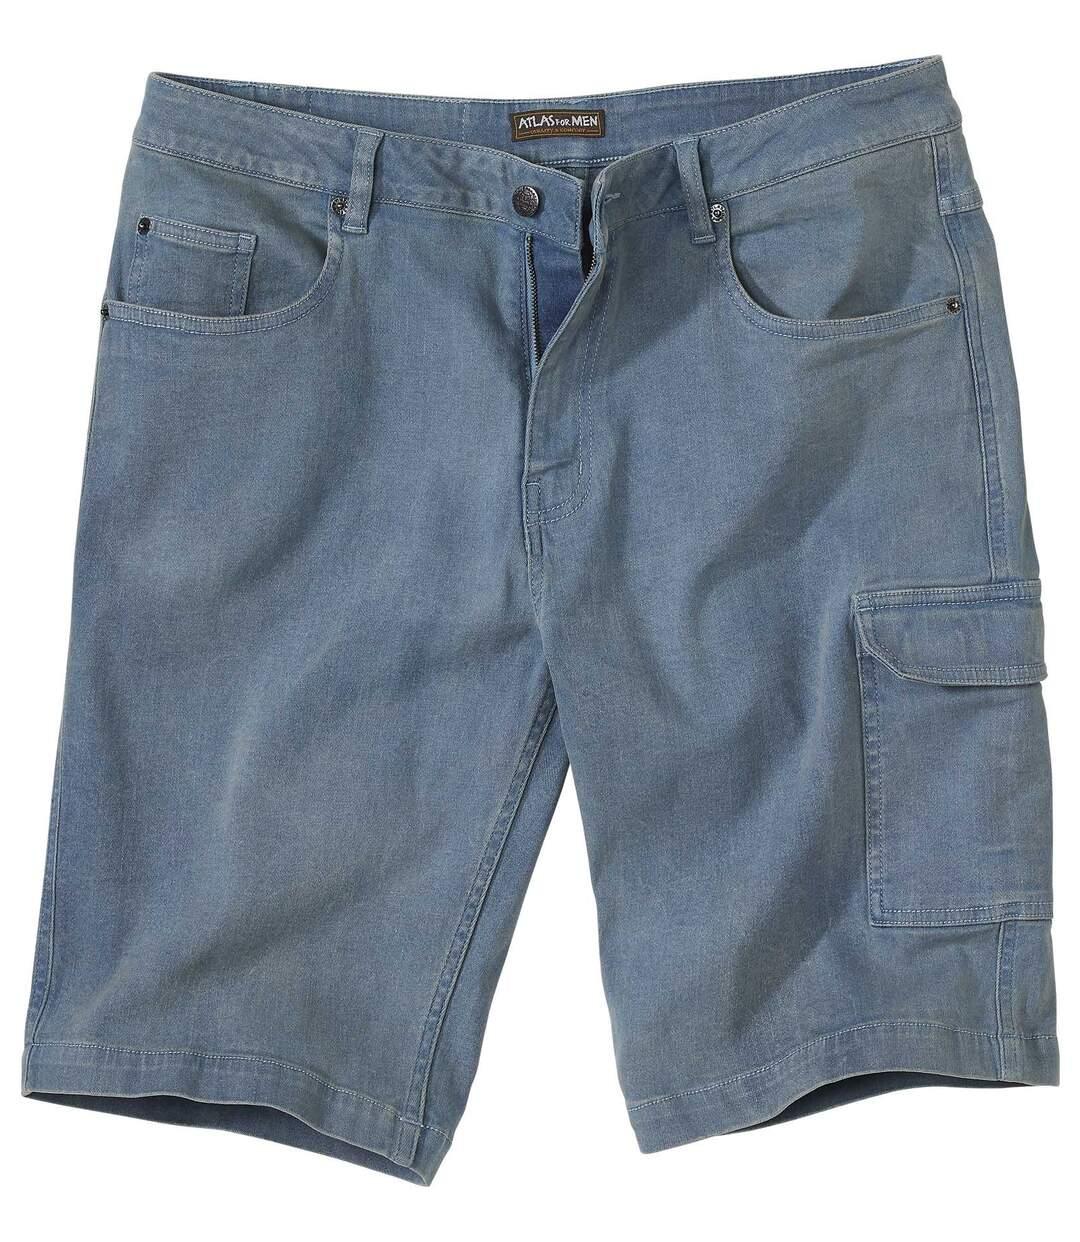 Zomerbermuda van stretch jeans